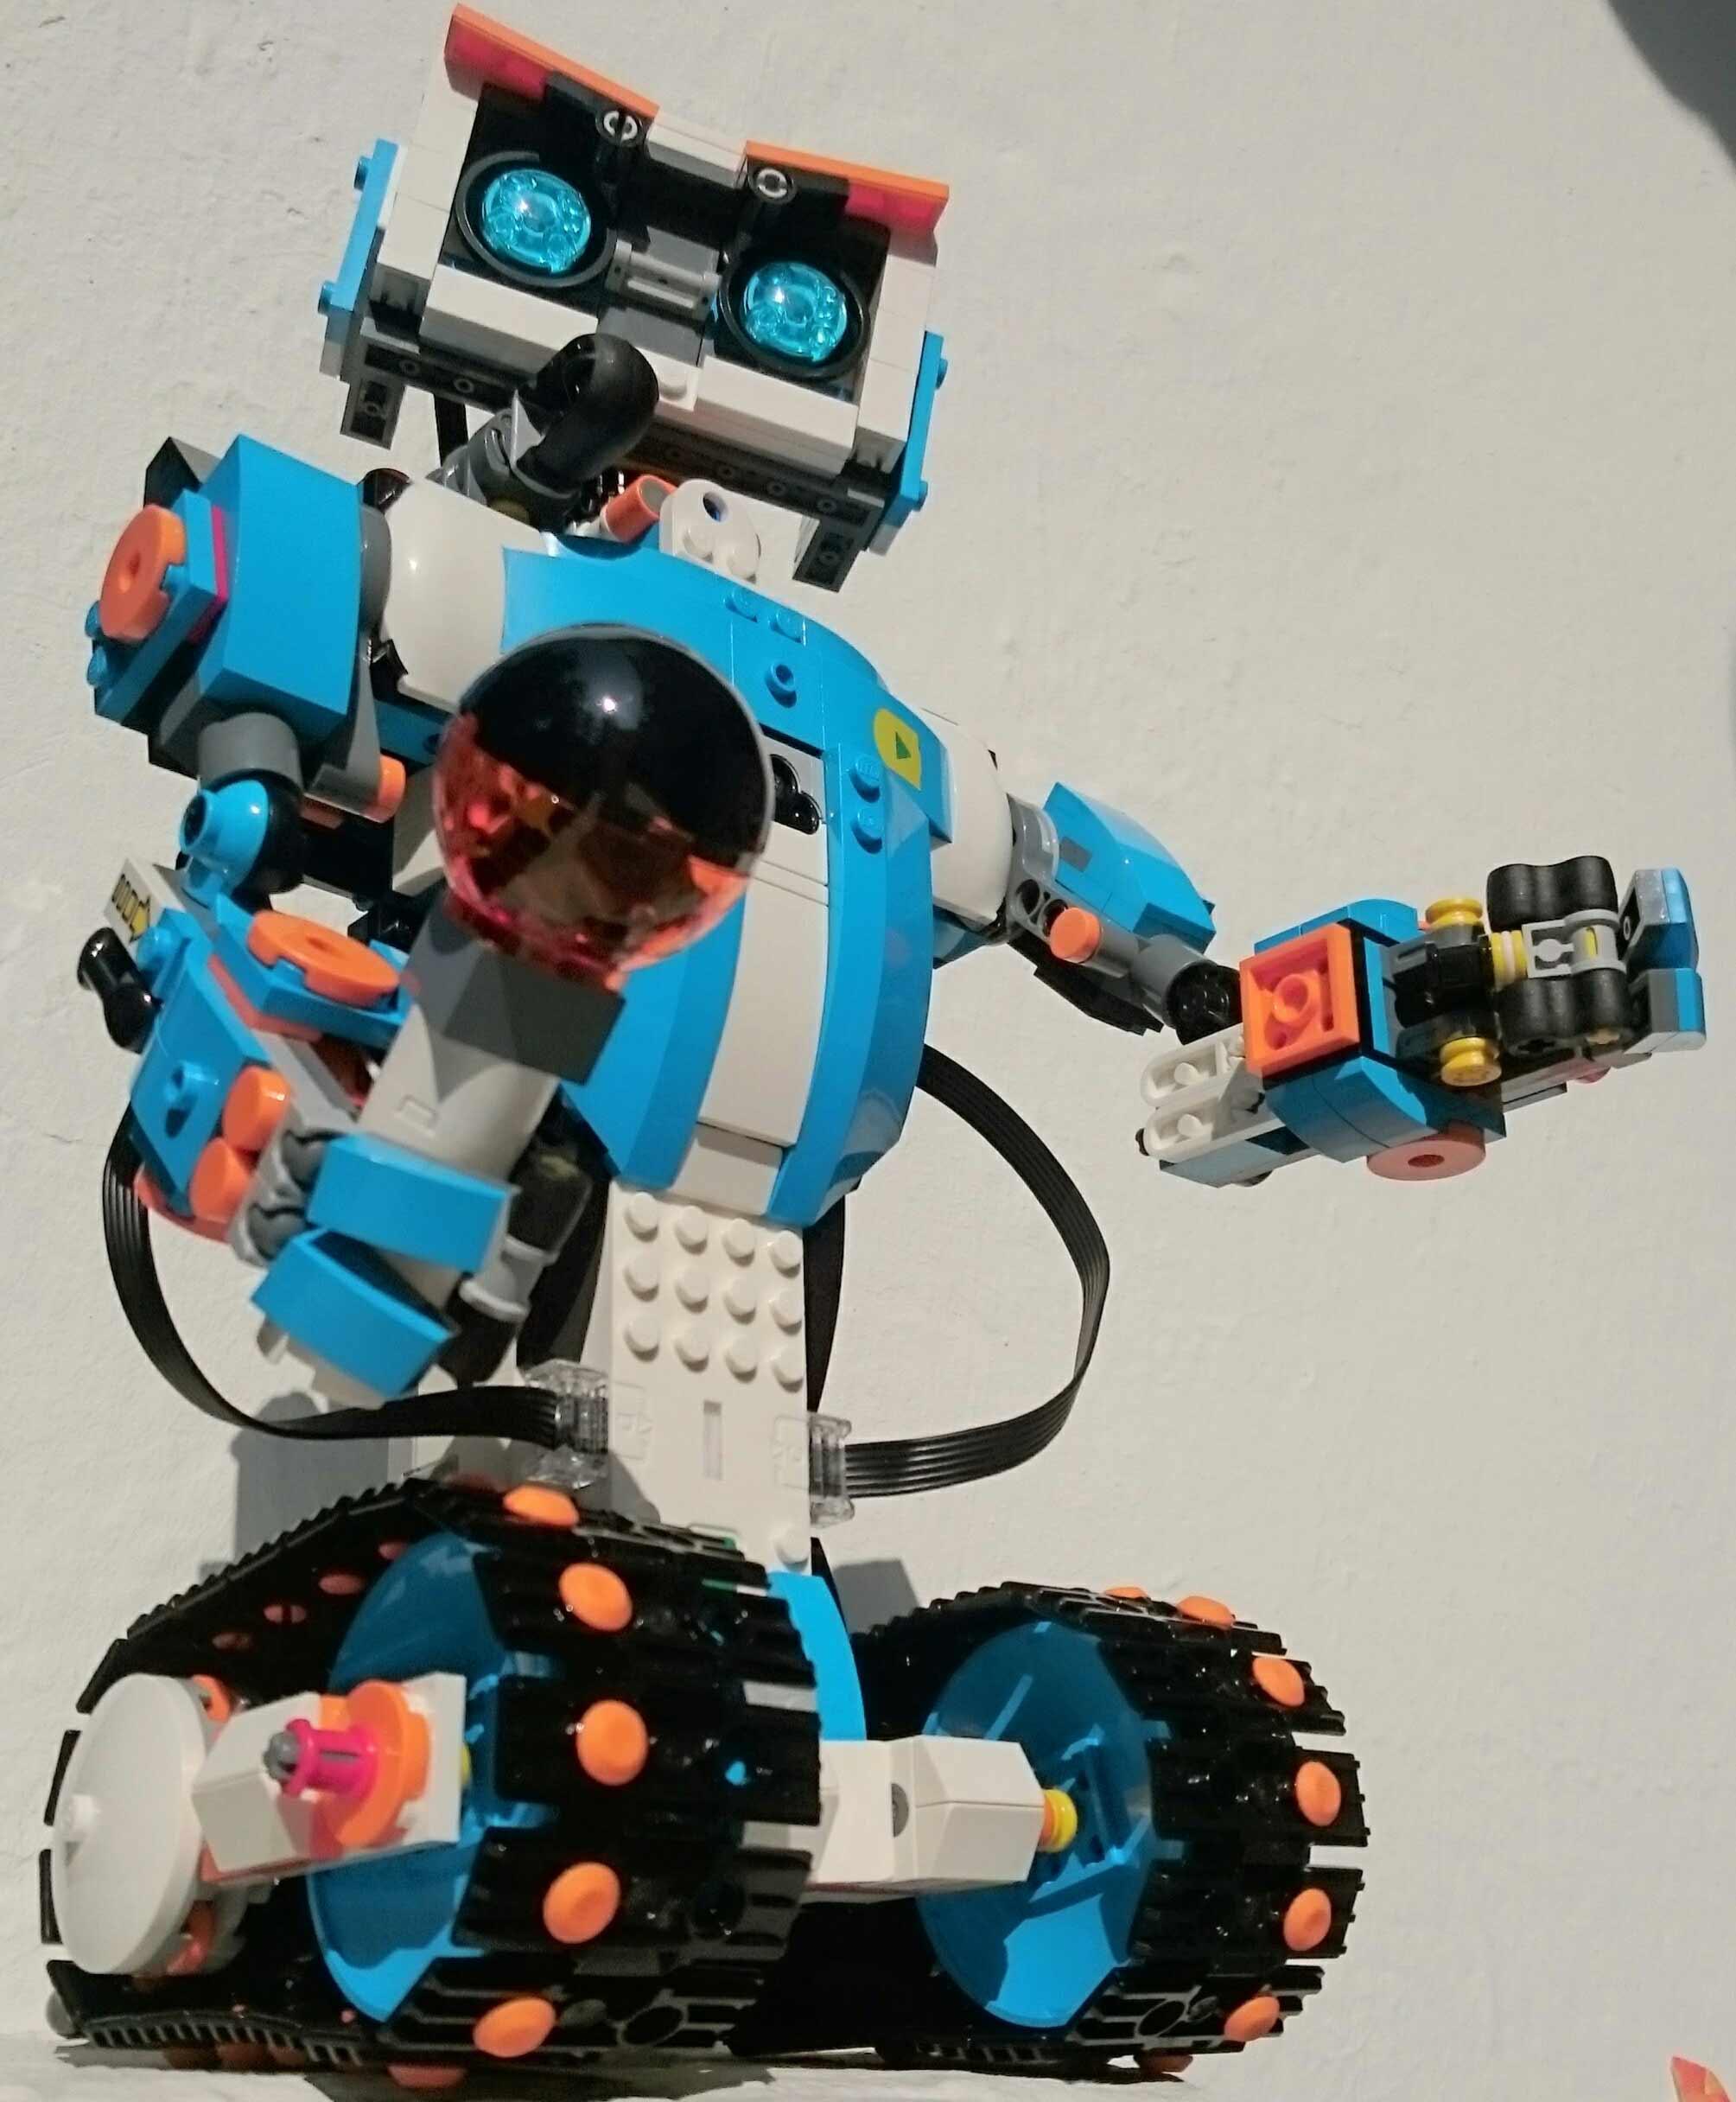 lego boost programmierbares roboticset 17101 im review. Black Bedroom Furniture Sets. Home Design Ideas